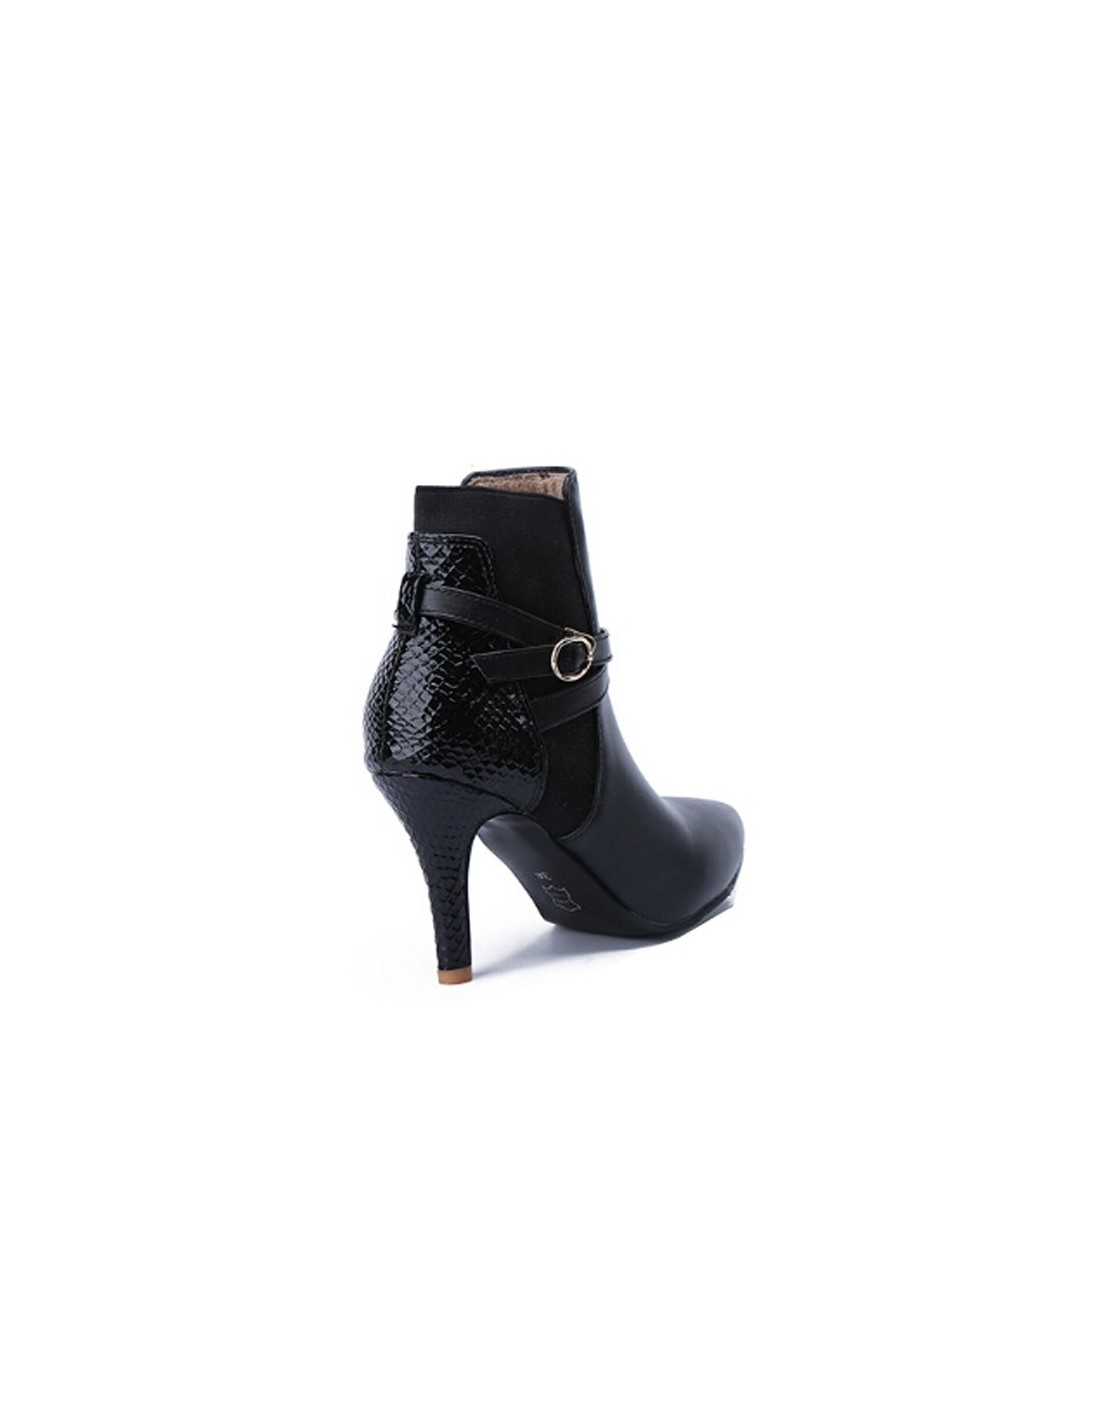 Bottinesamp; Tamaris Podma Noir Bottes NoiresFemme Boots